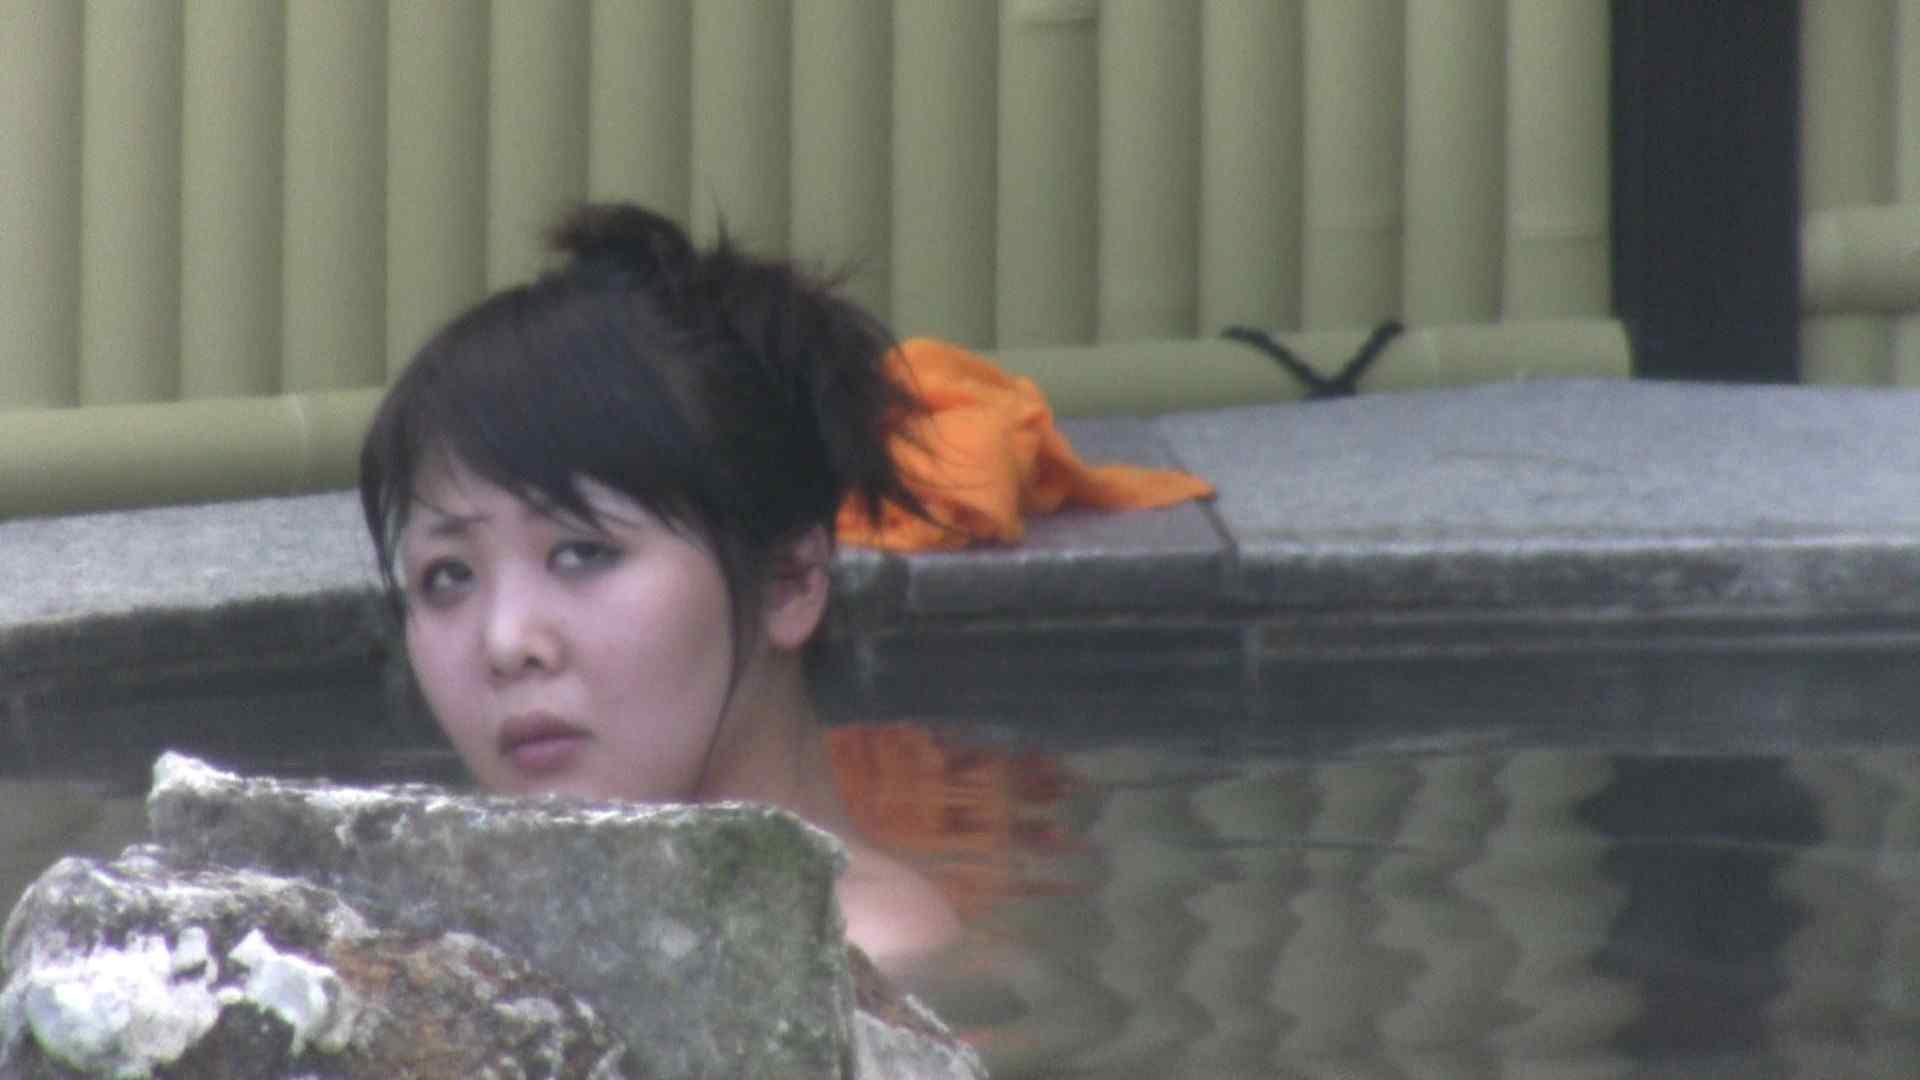 Aquaな露天風呂Vol.118 OL女体 | 露天  68連発 46